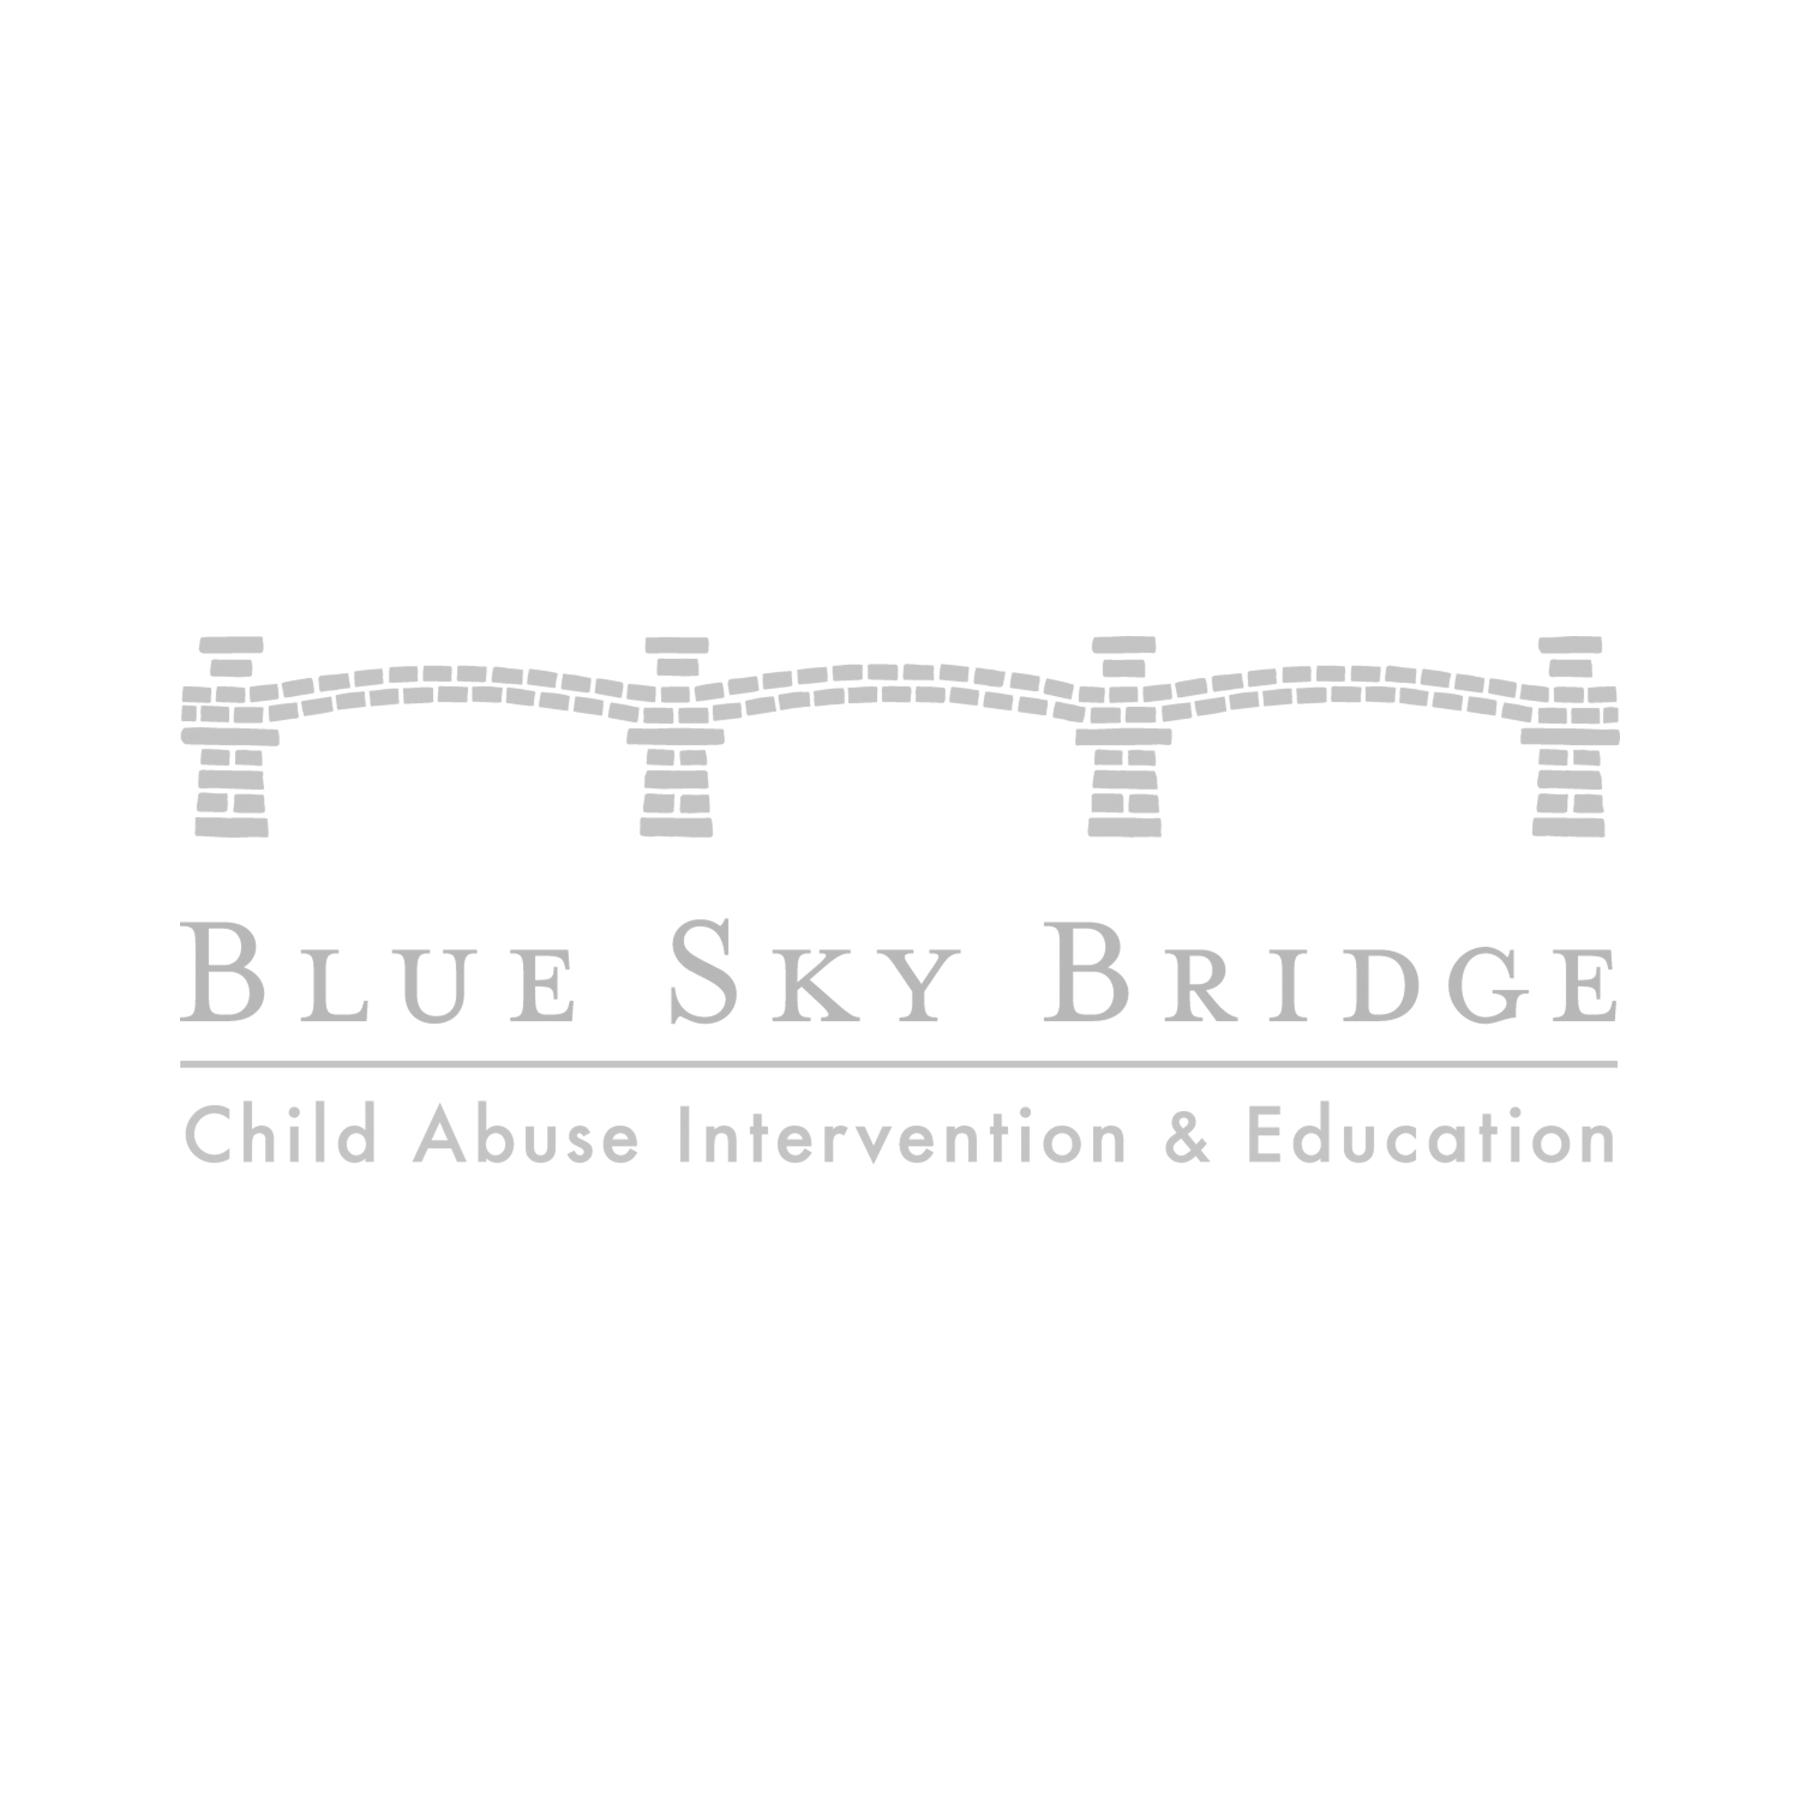 BSB-Logo-2018.png